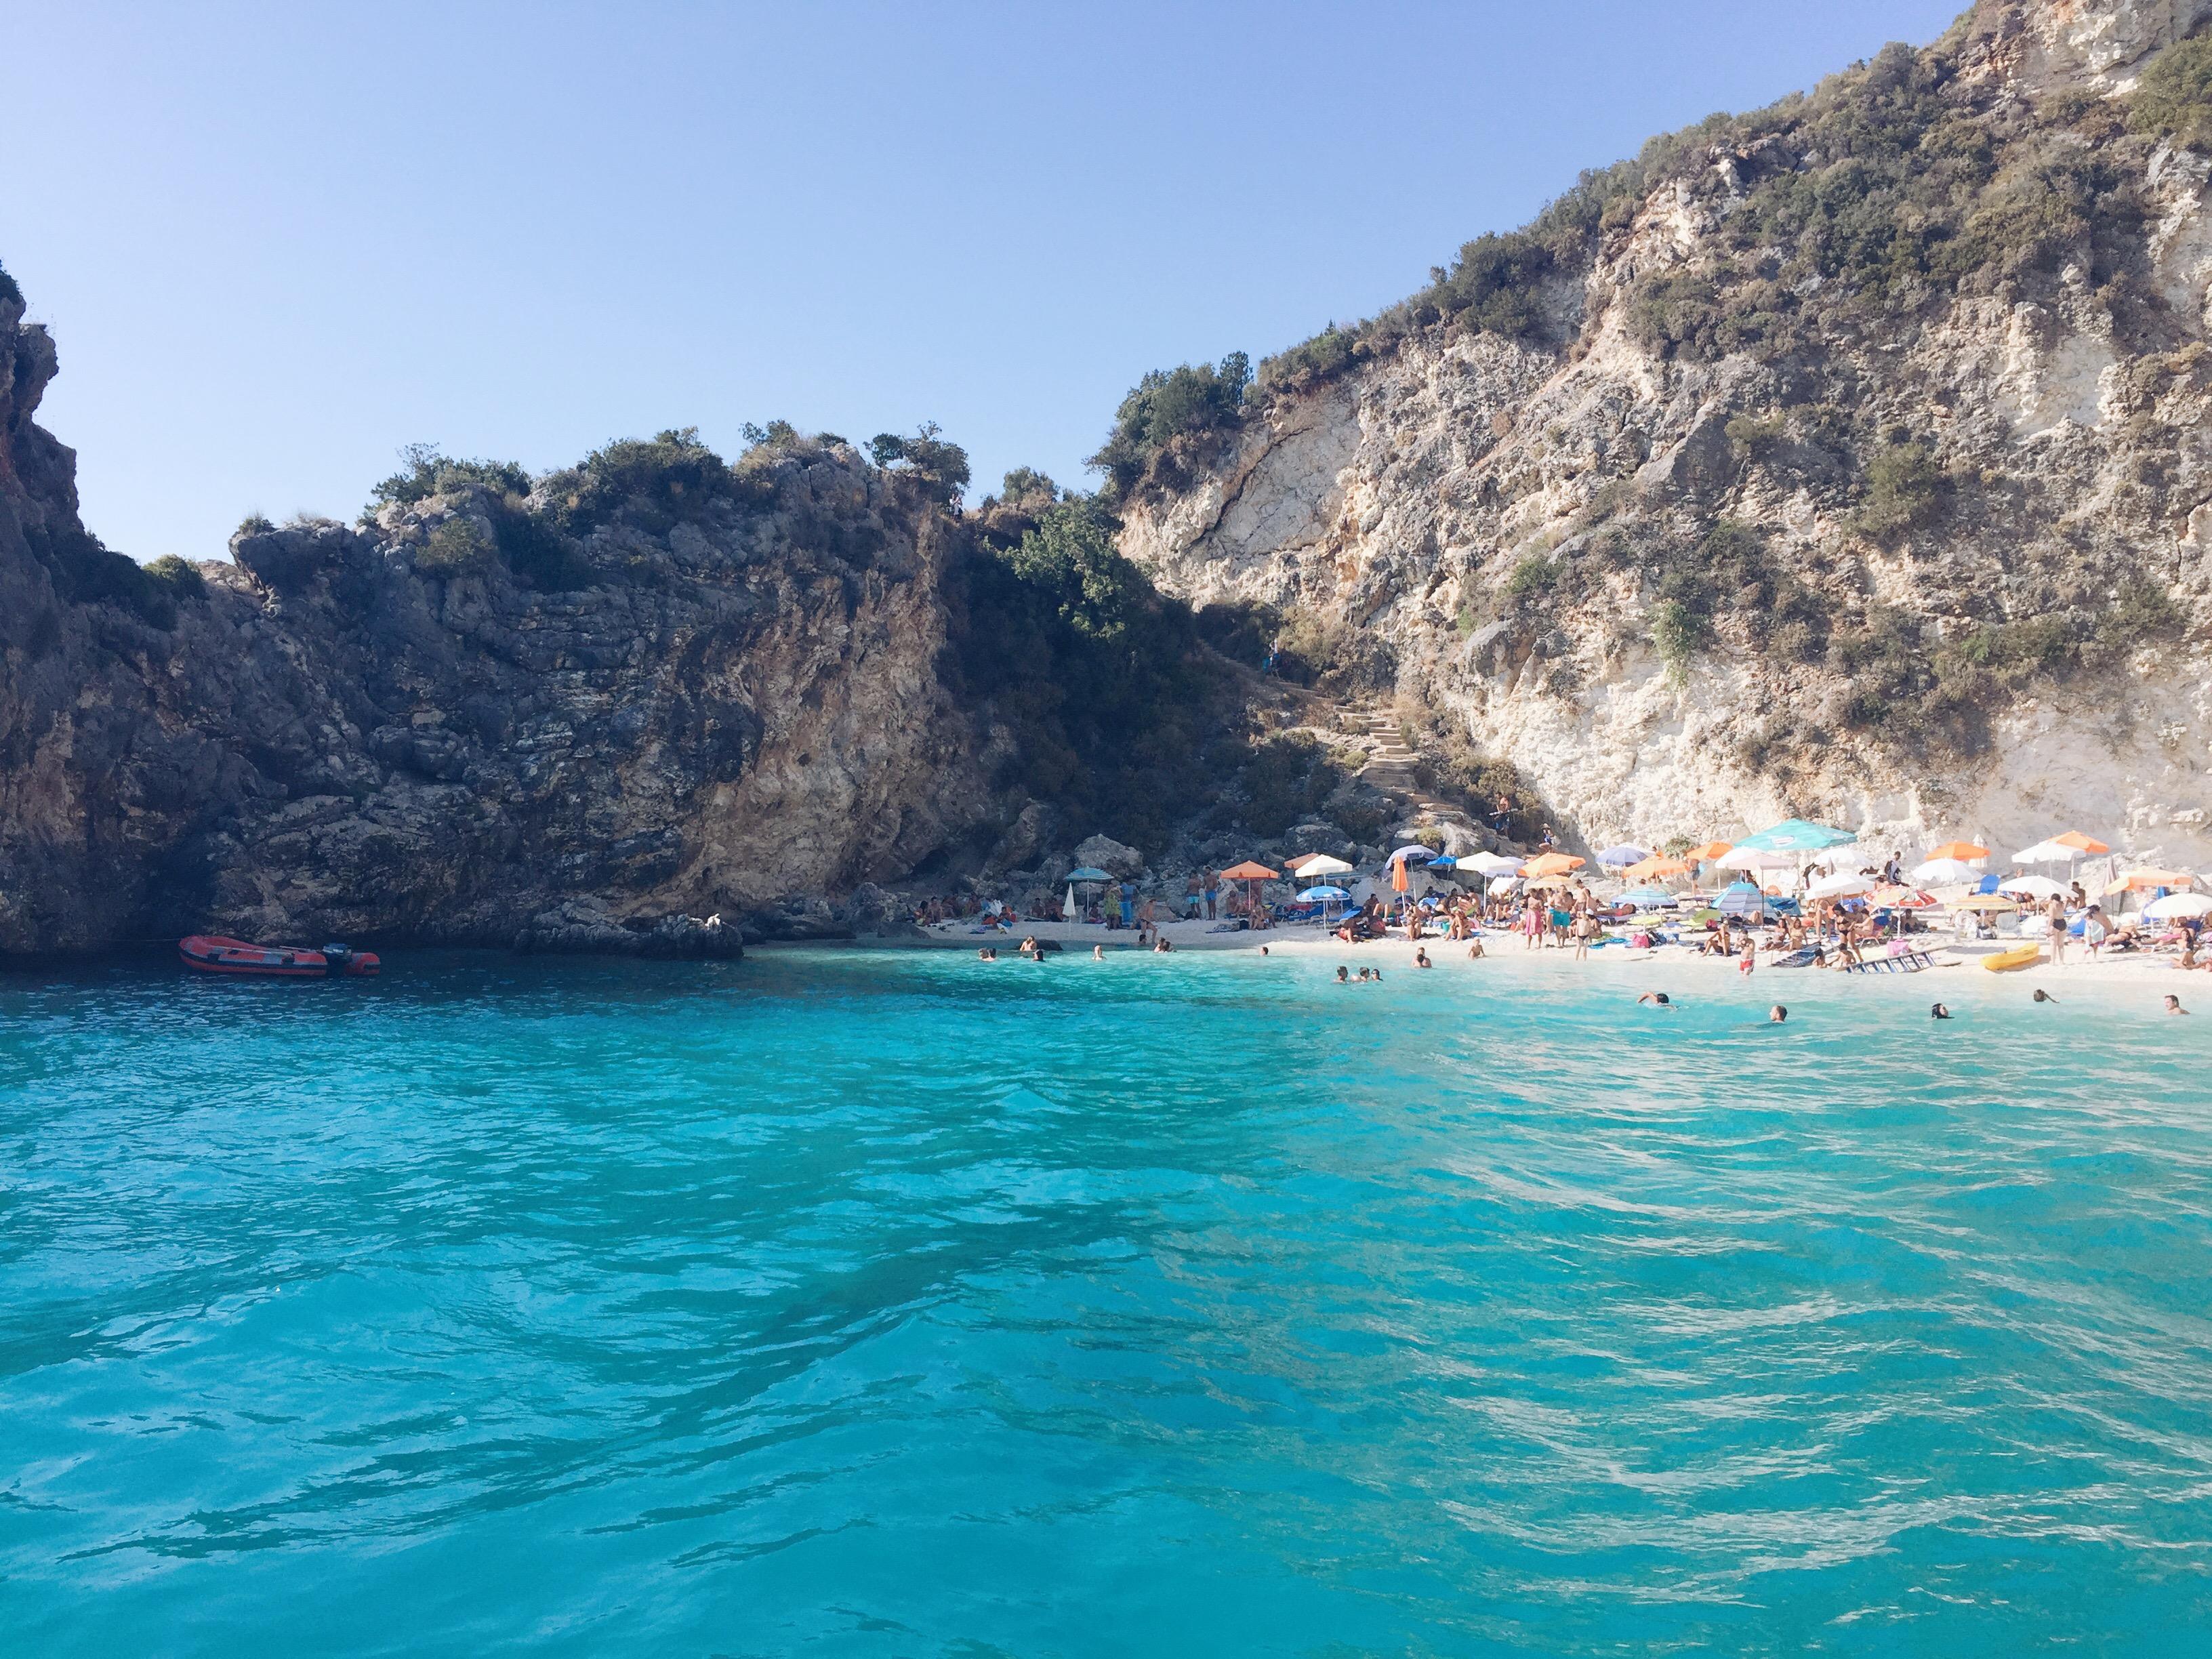 Grekland amandahans Agiofili beach, skönhetsblogg, skönhetsbloggare, amandahans, grekland, båt, segling, semester